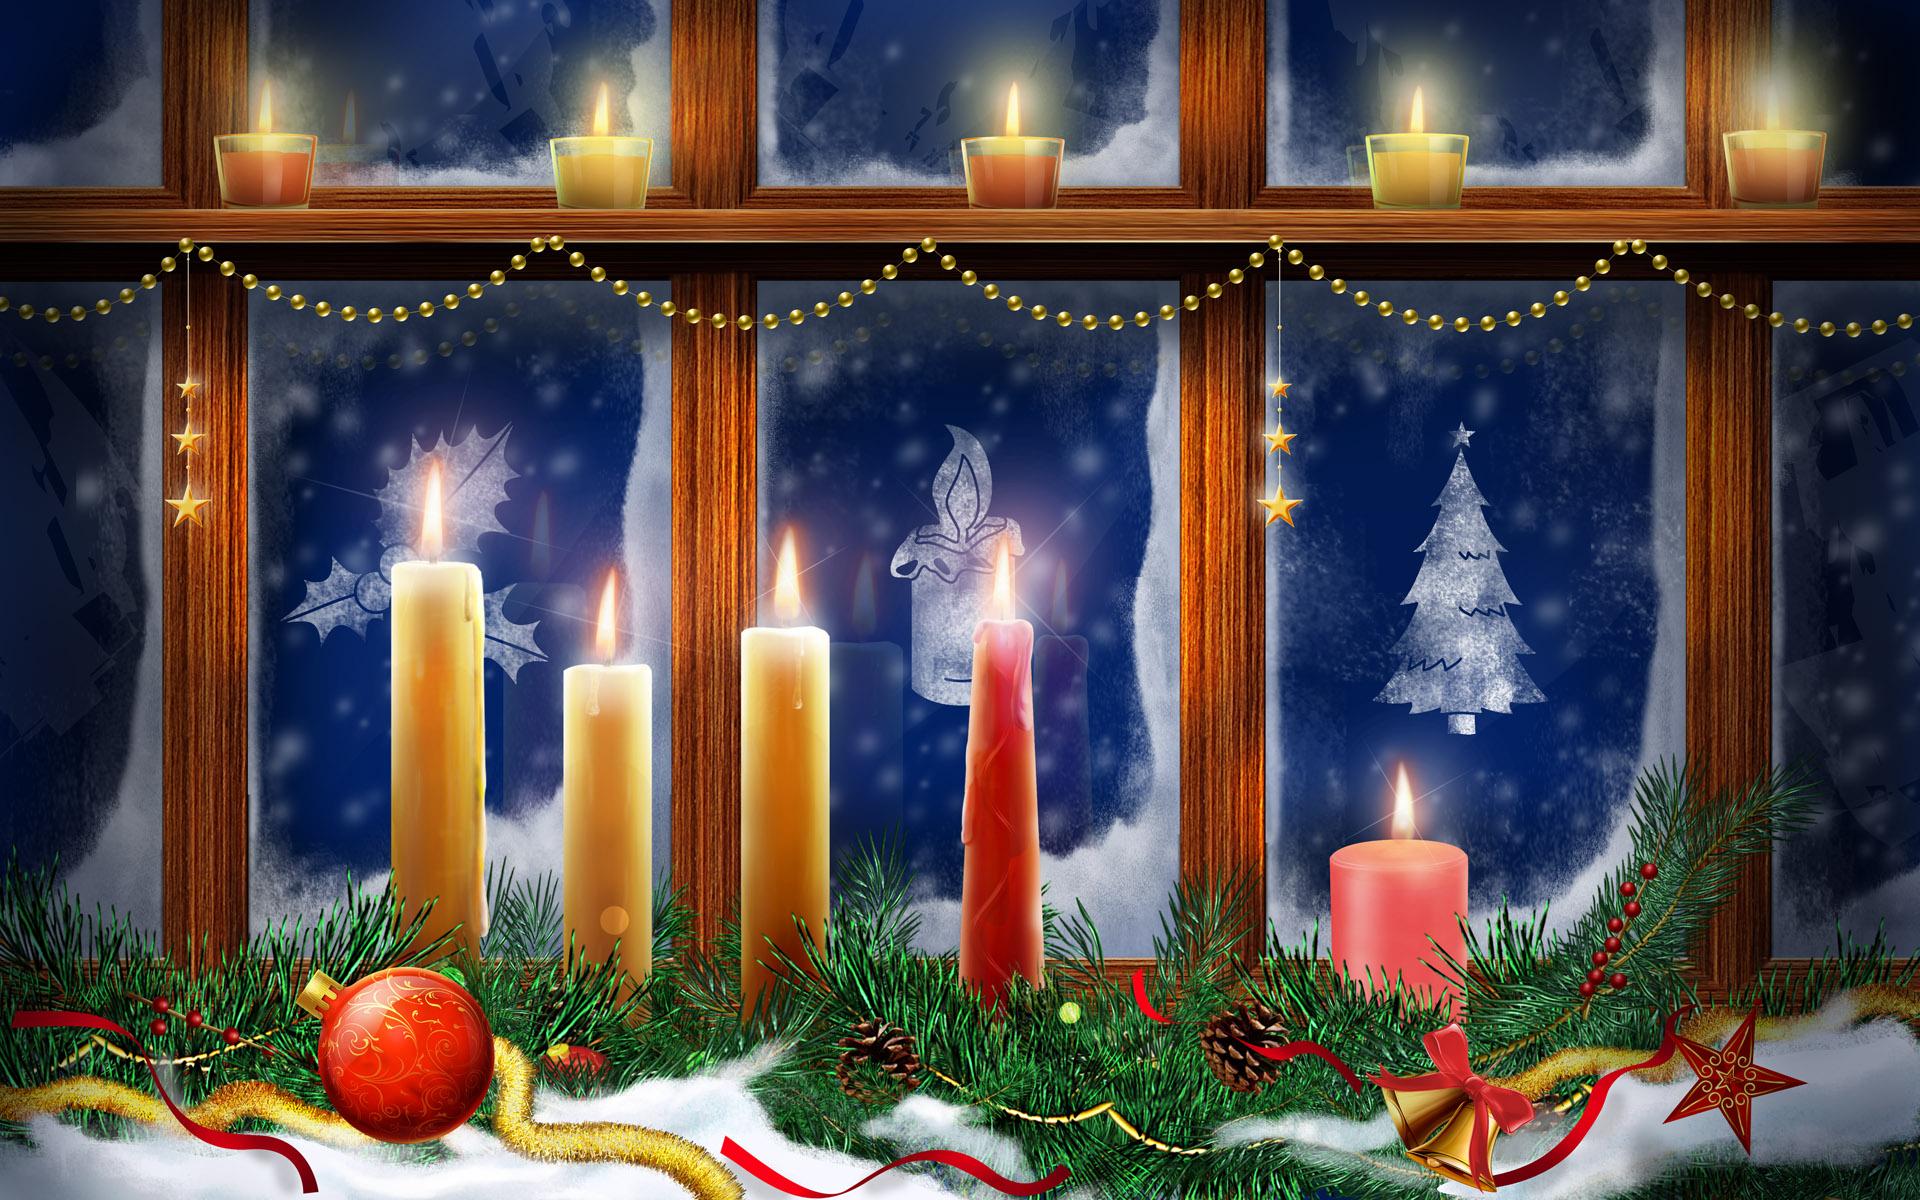 Christmas Lighting Candles Wallpapers HD Wallpapers 1920x1200